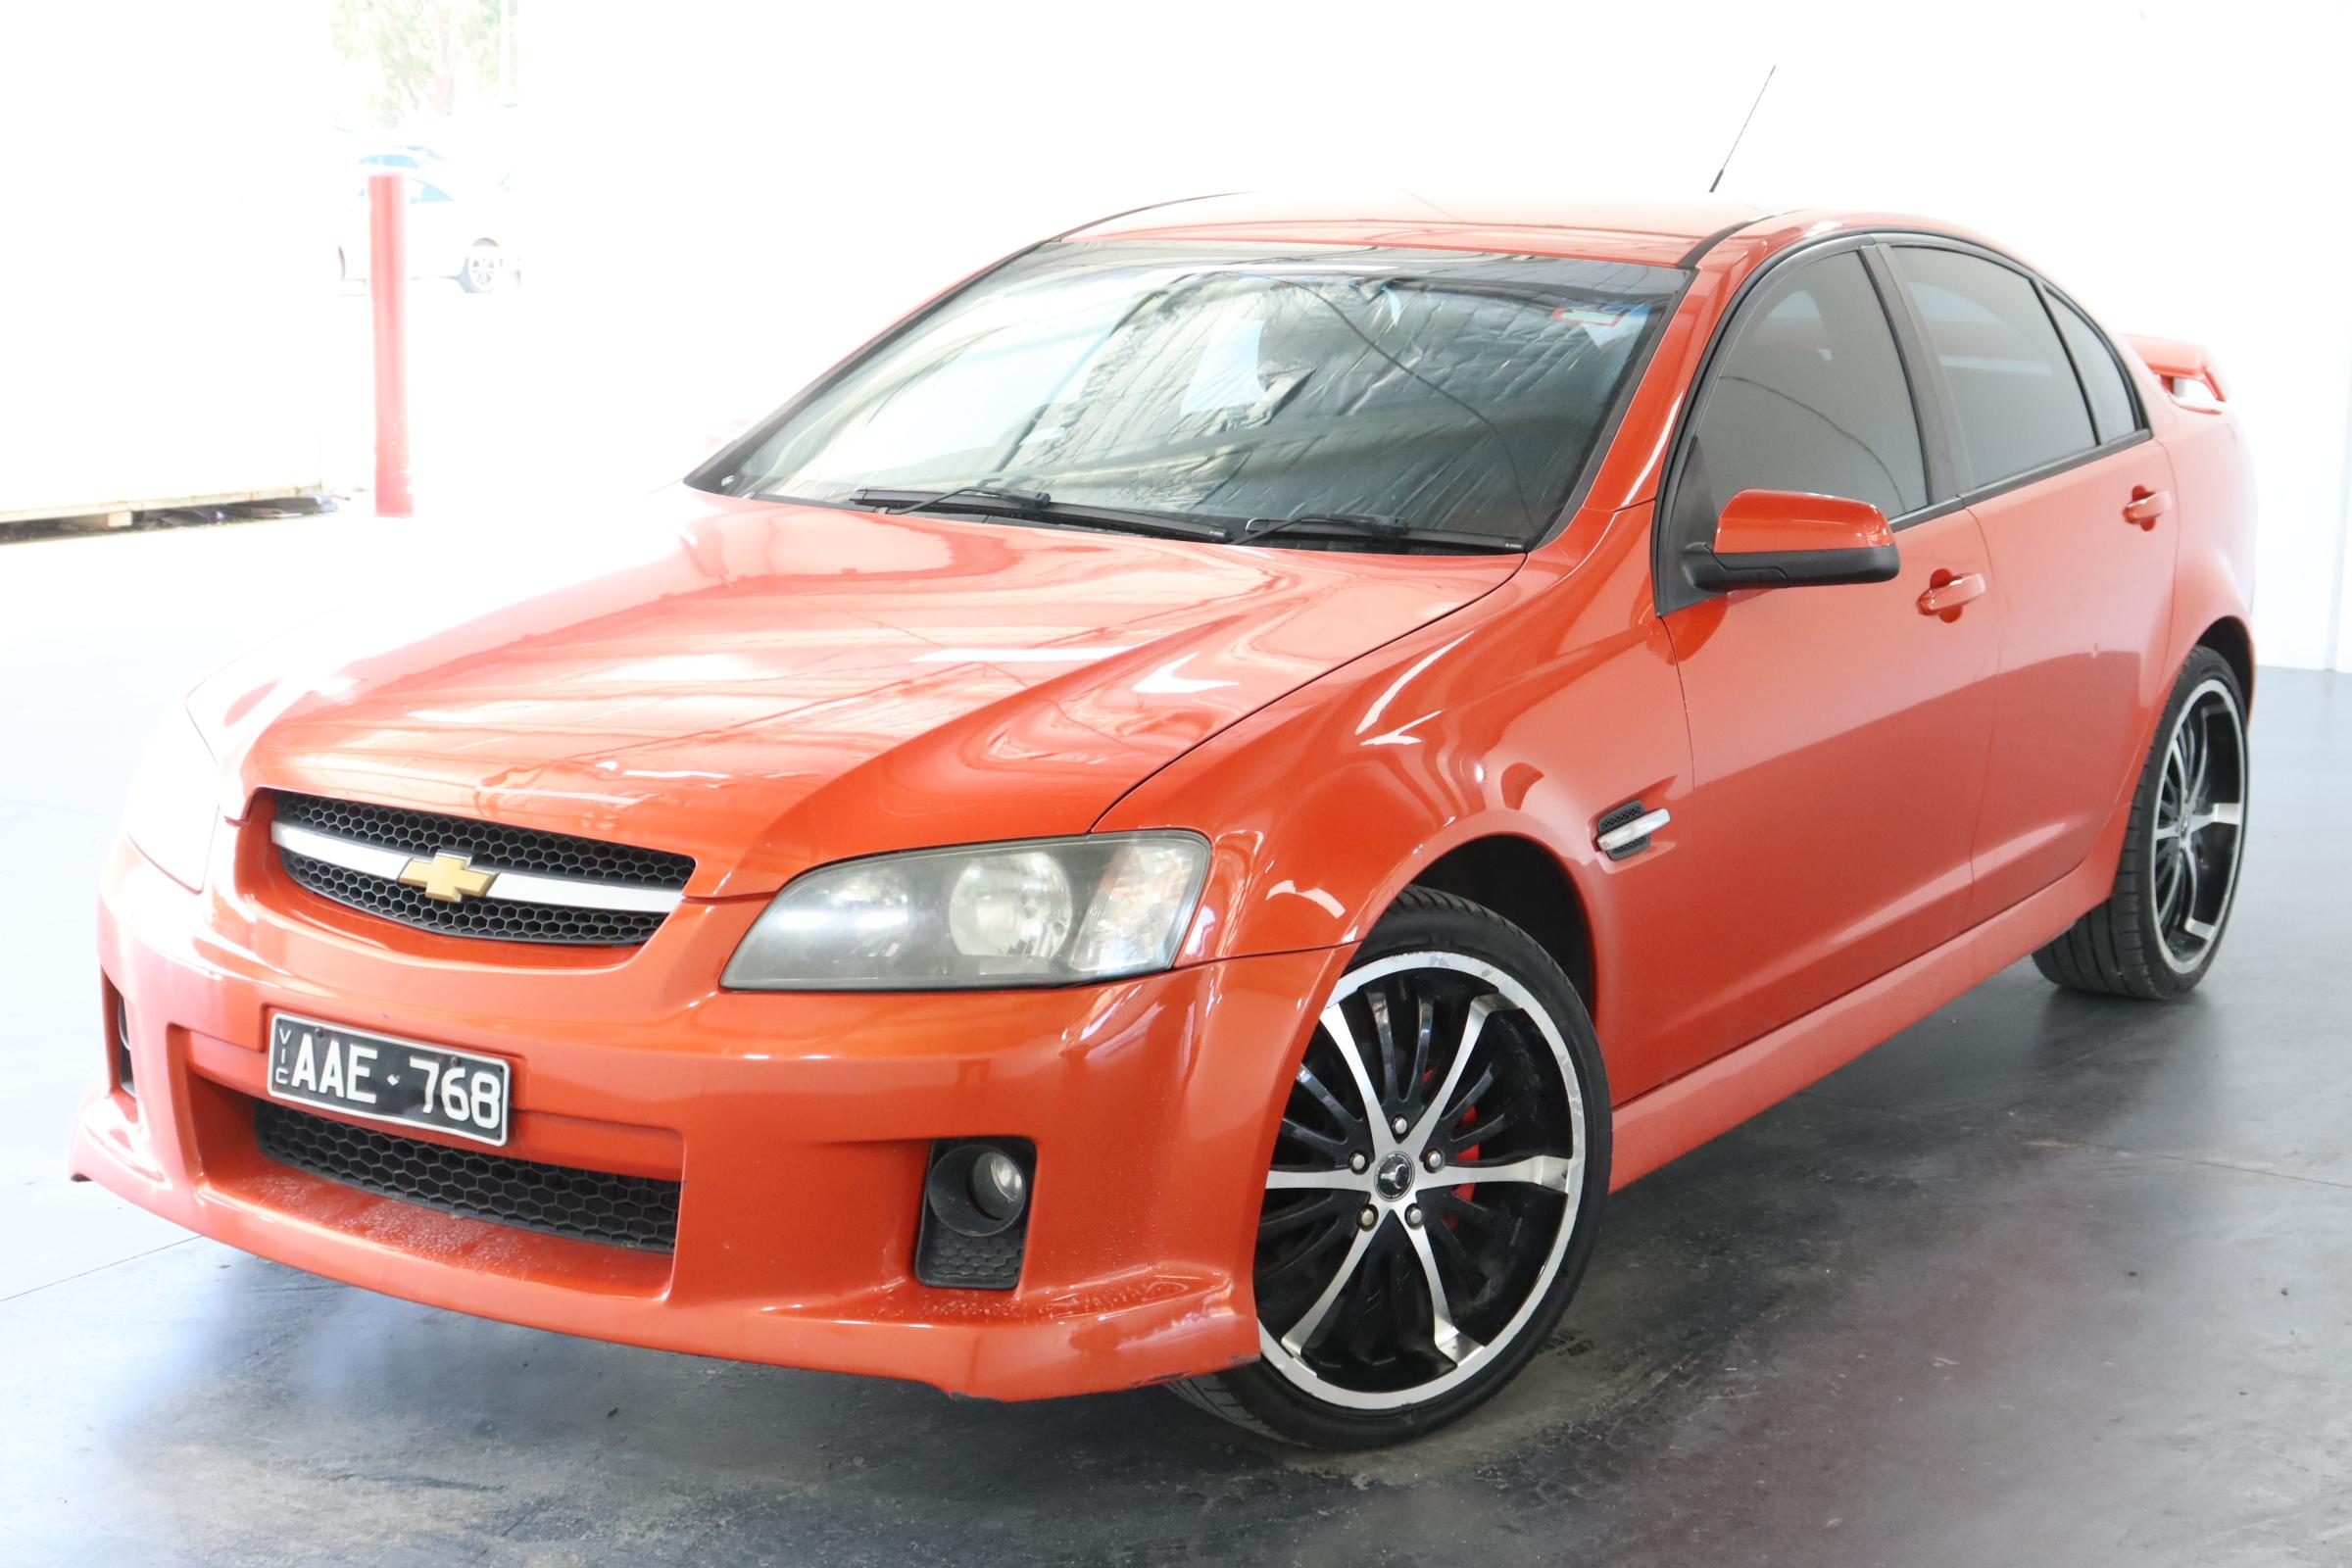 2007 Holden Commodore SV6 VE (WOVR)